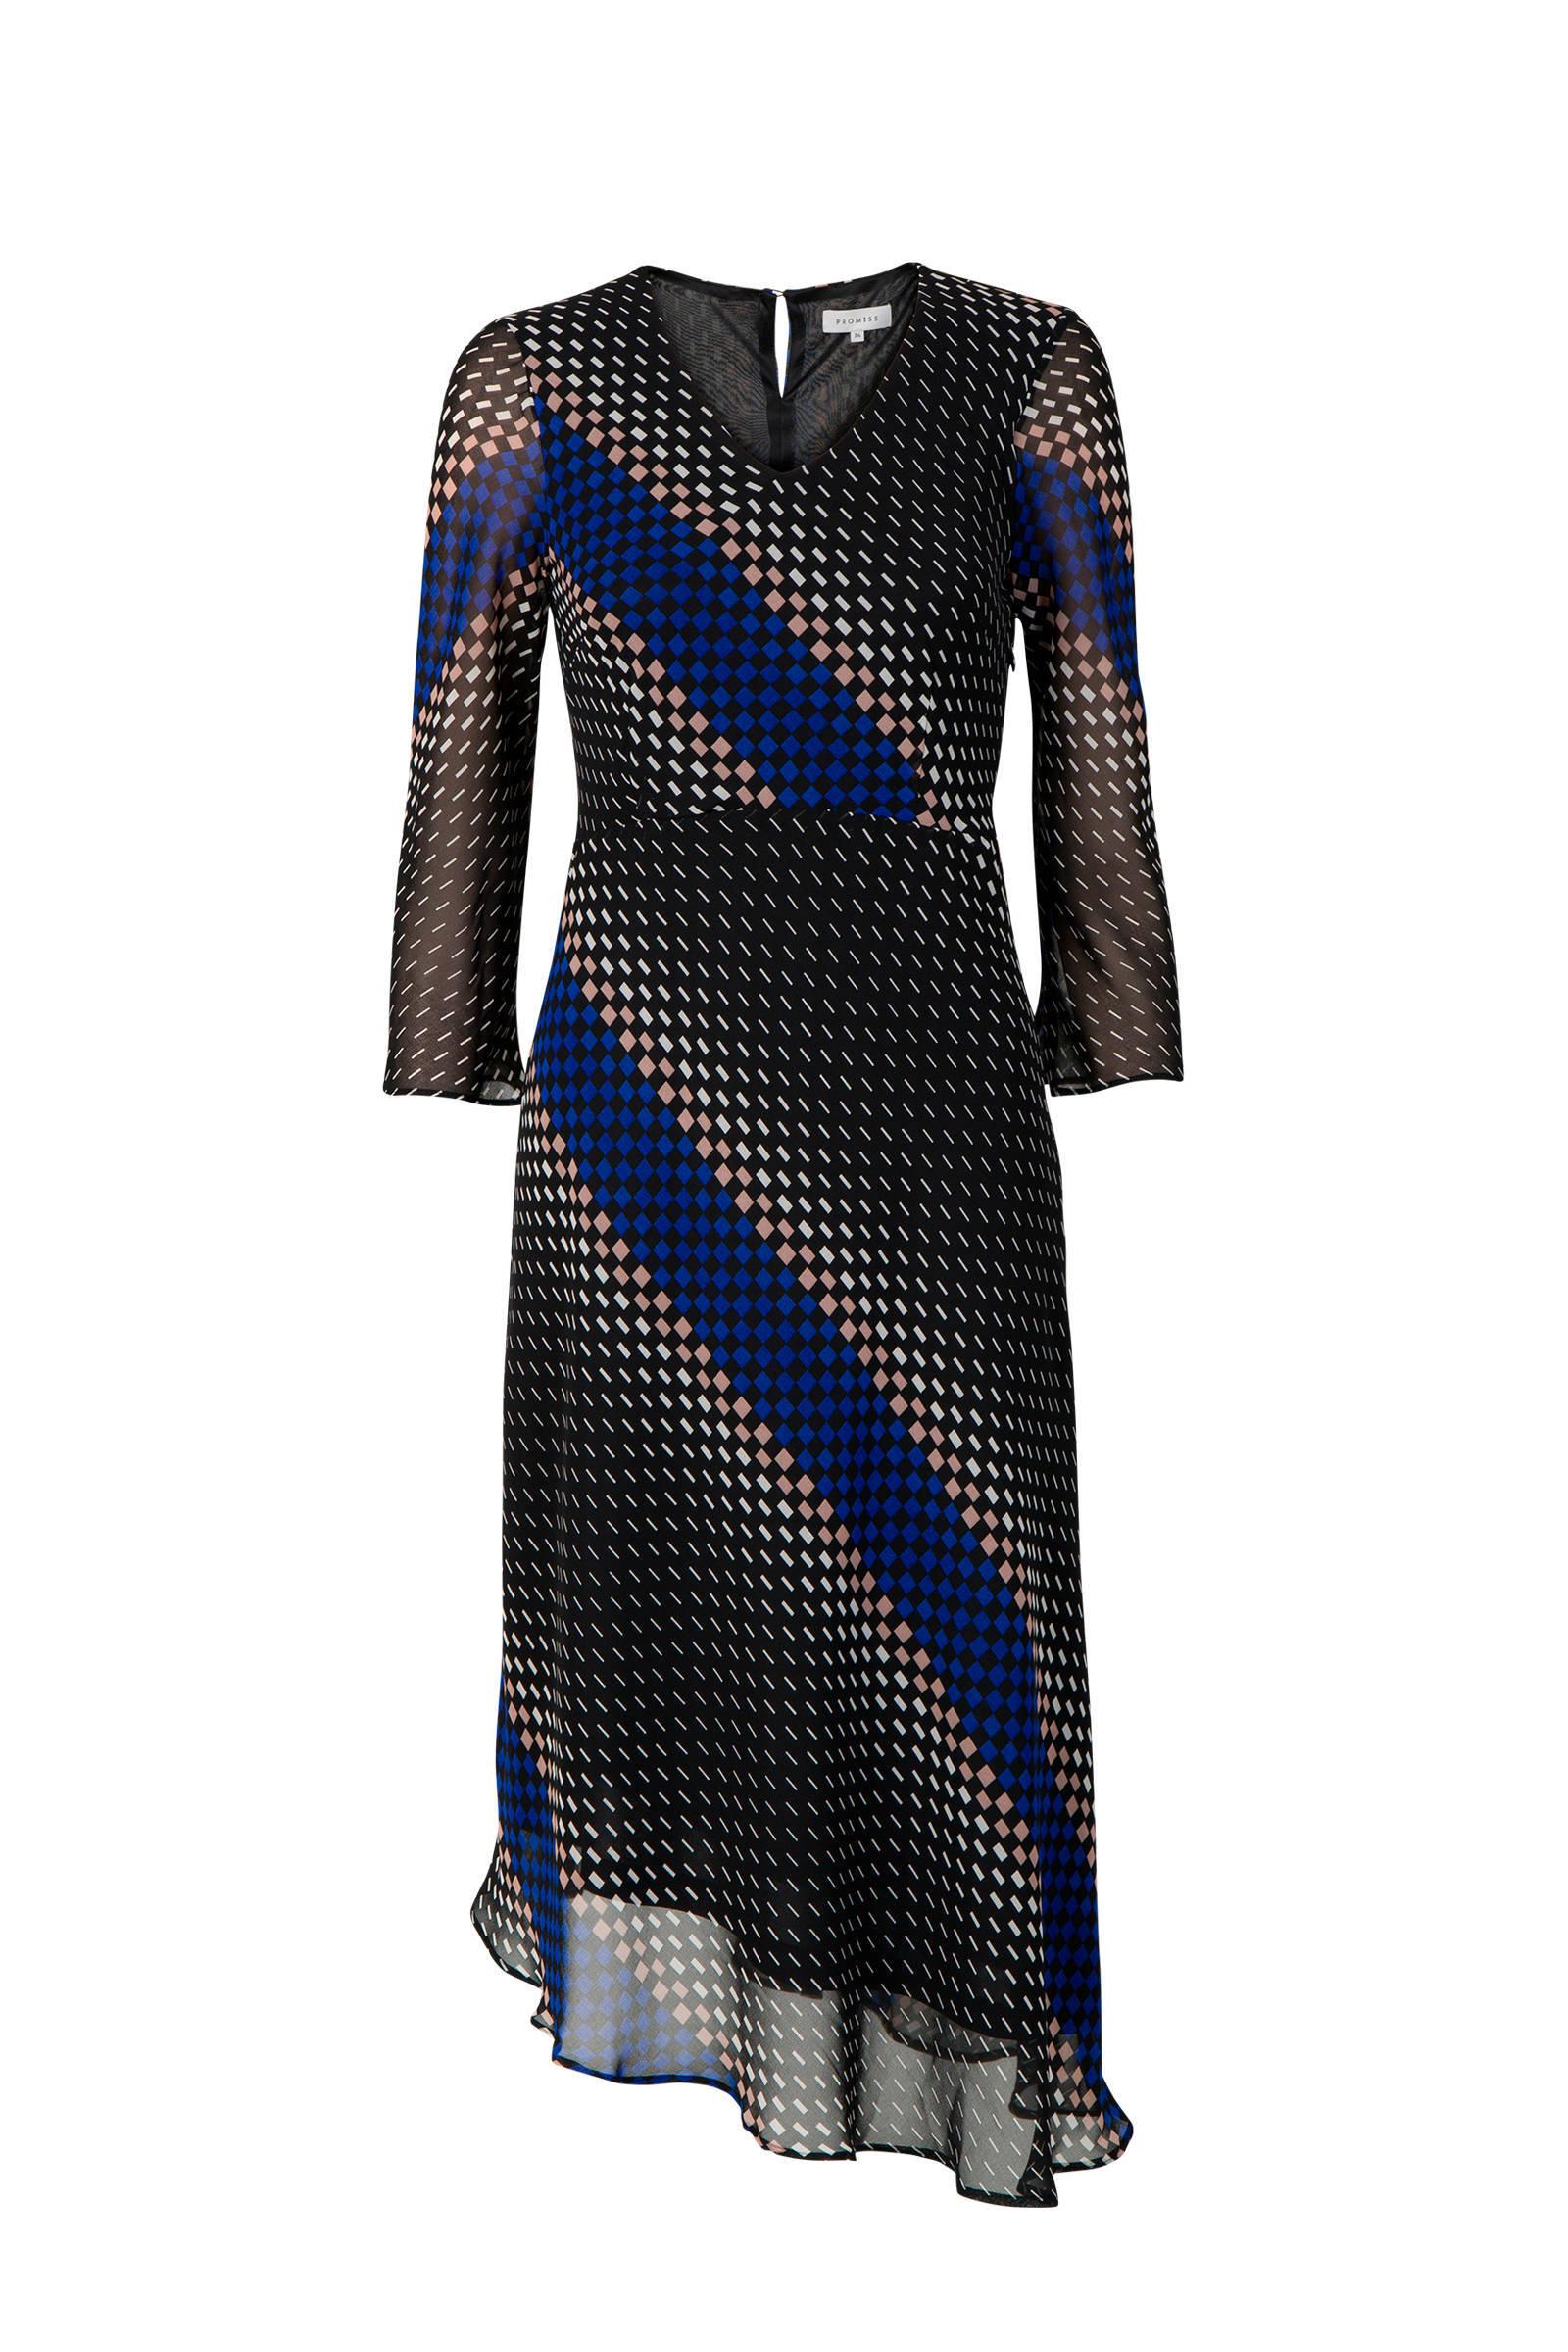 zwart blauwe jurk